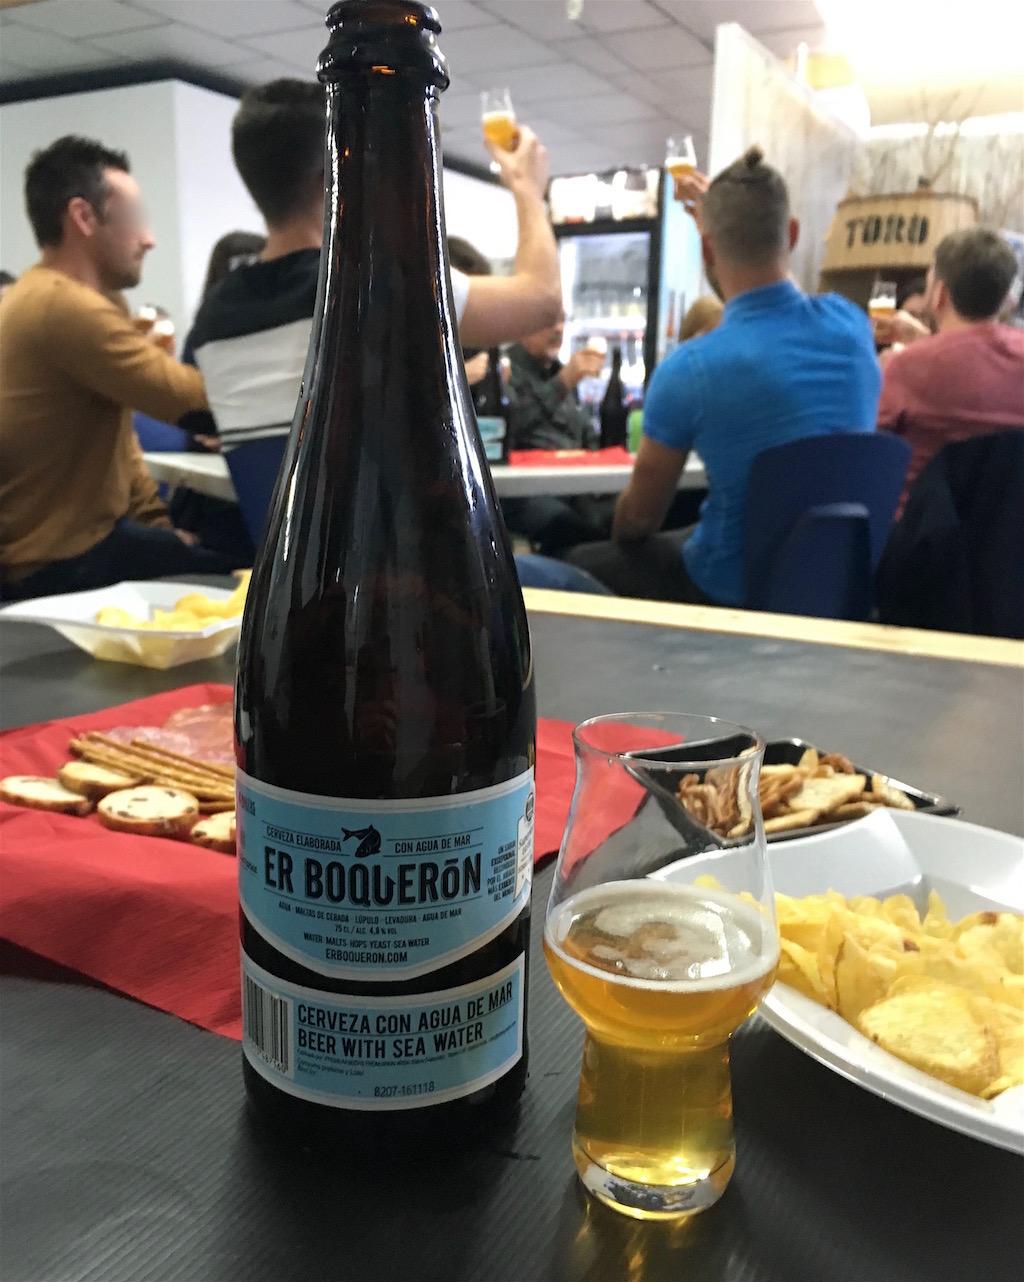 Er Boqueron cerveza tasting